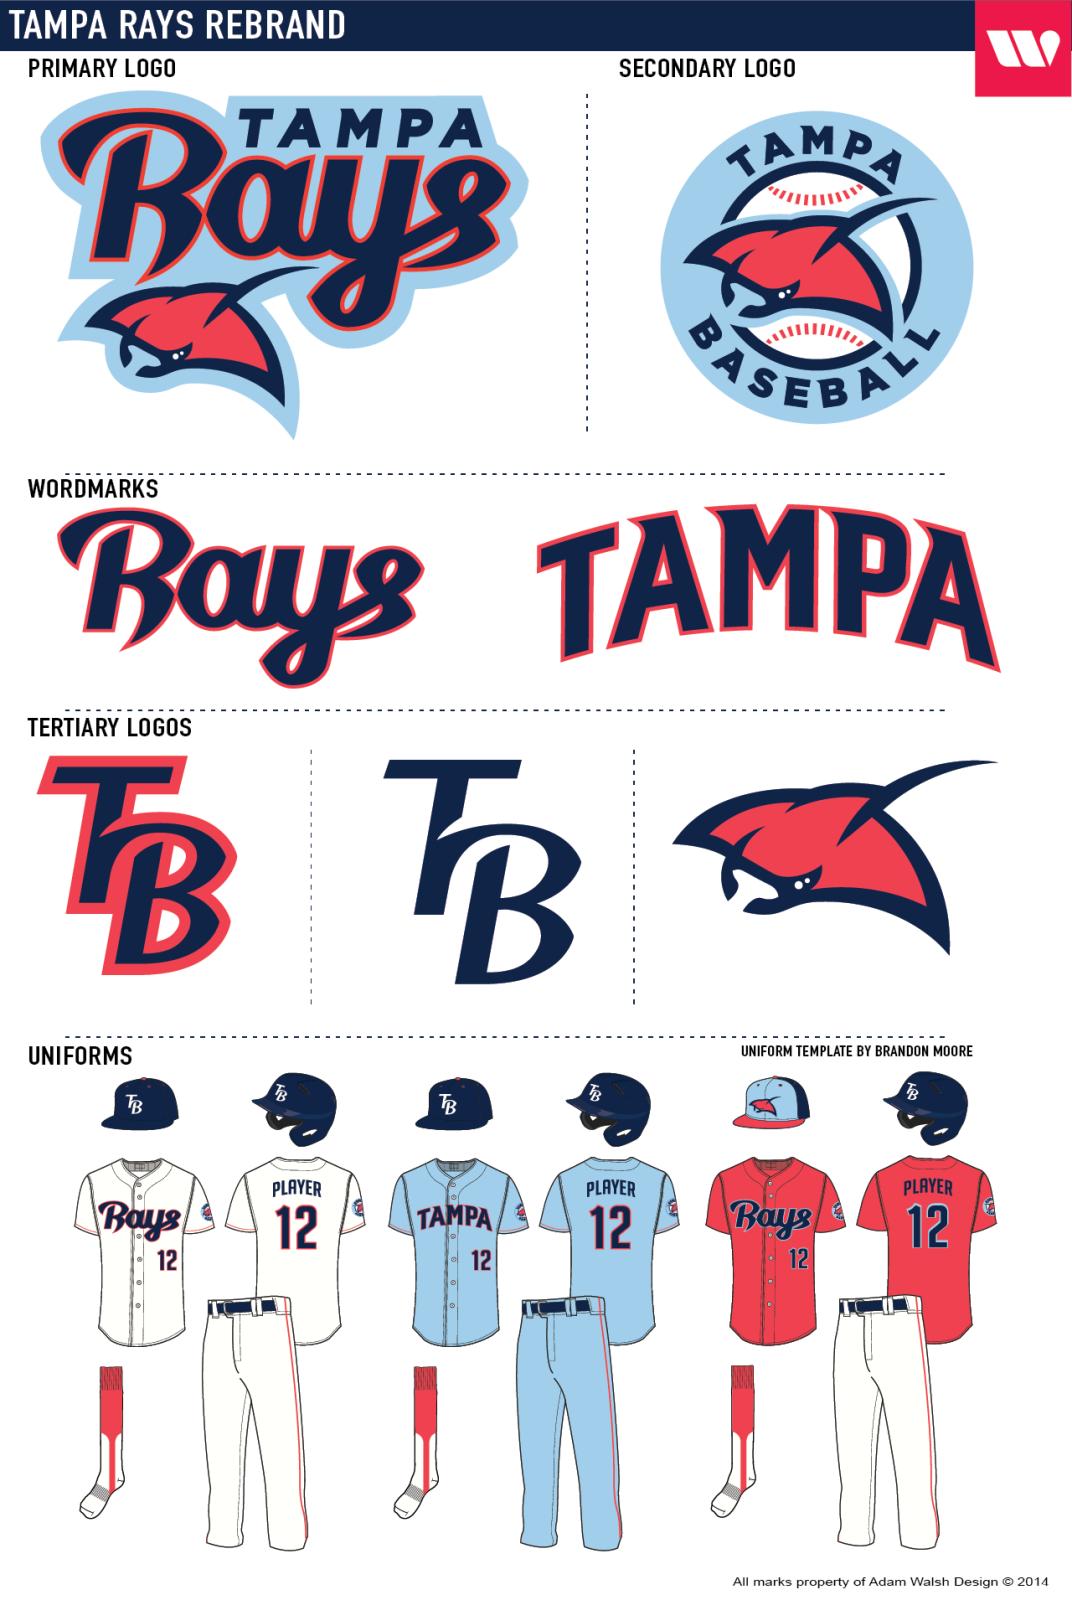 Tampa Rays Rebrand Tampa Rebranding Tampa Bay Rays